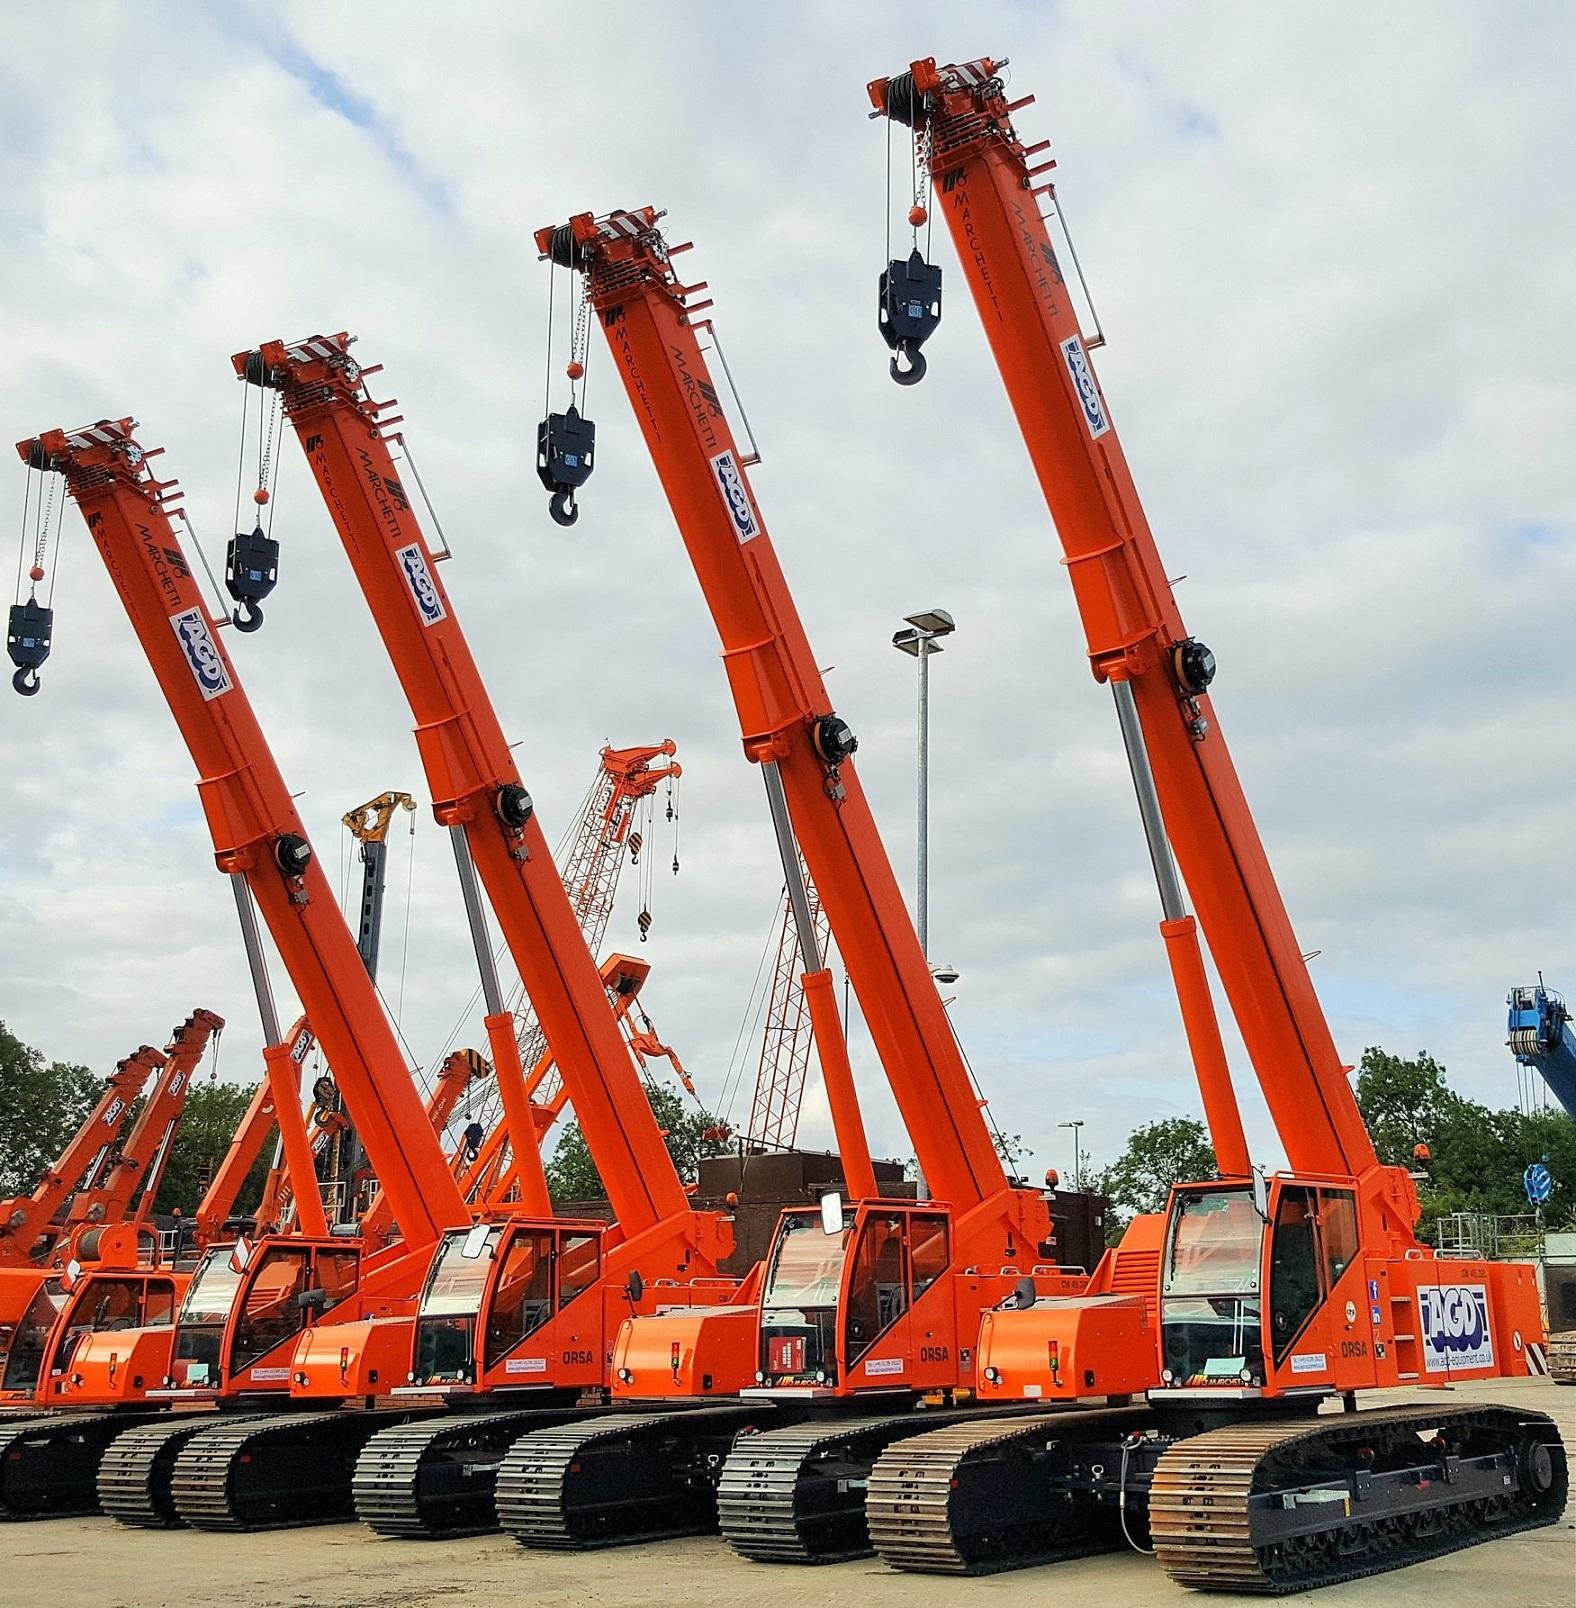 45 tons Telescopic Crawler Crane Hire